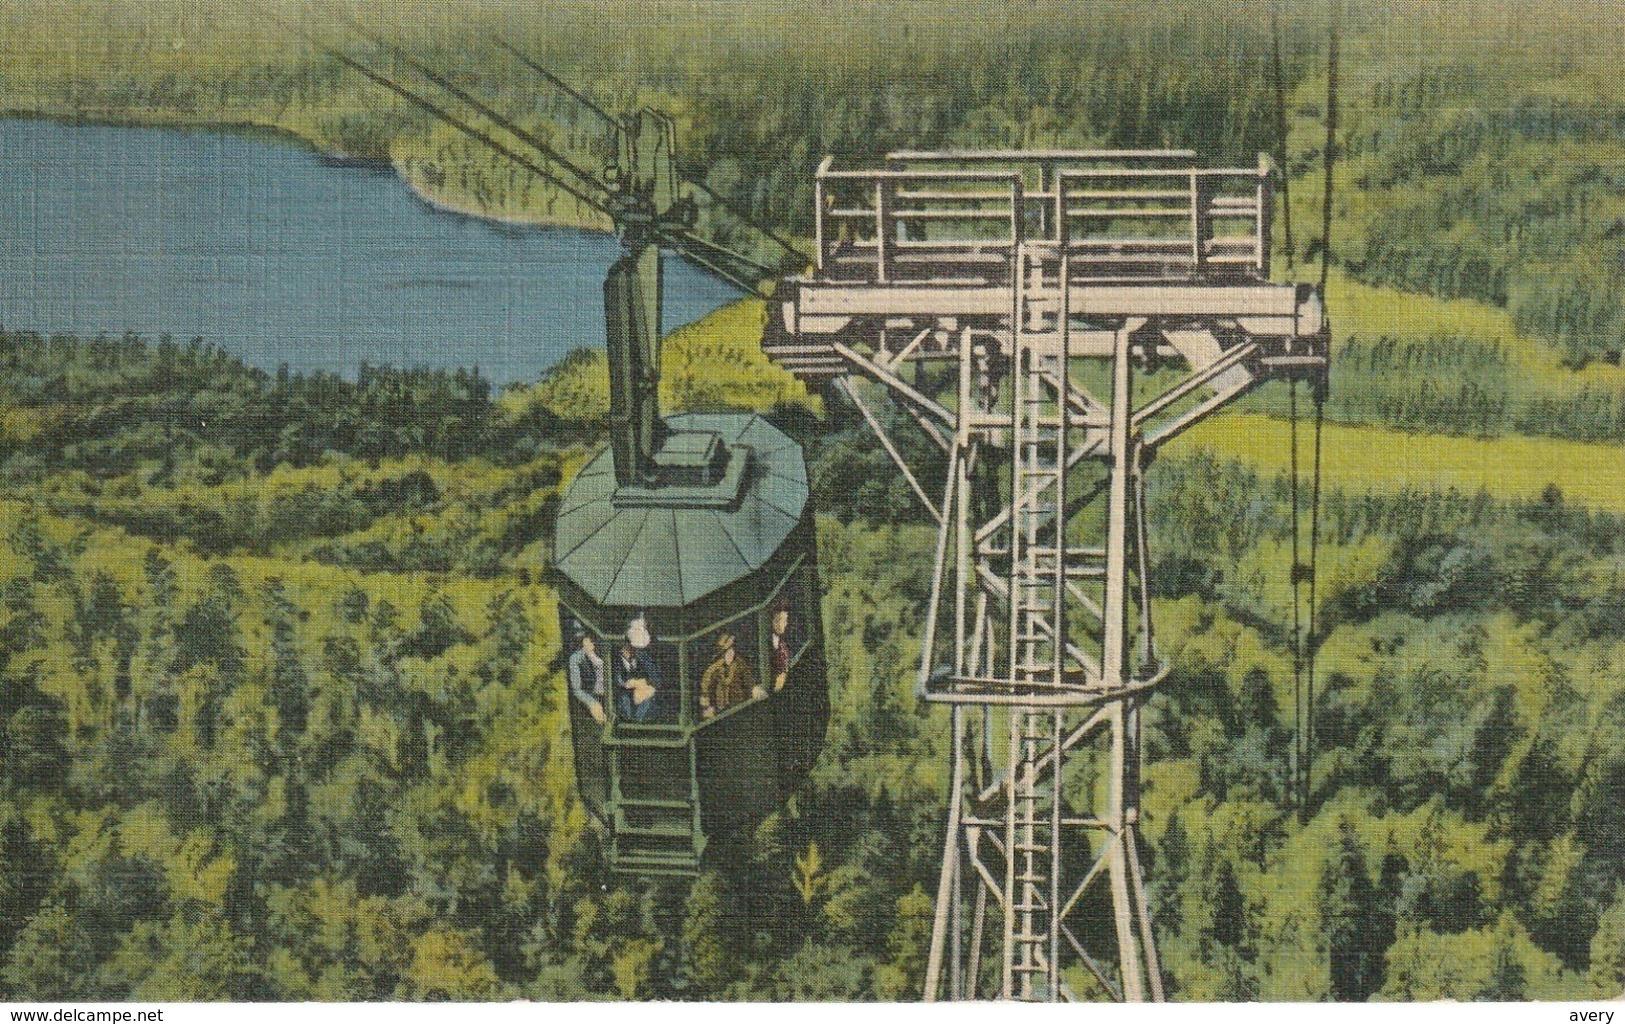 Tram Car, Cannon Mountain Aerial Tramway, Franconia Notch, White Mountains, New Hampshire - White Mountains